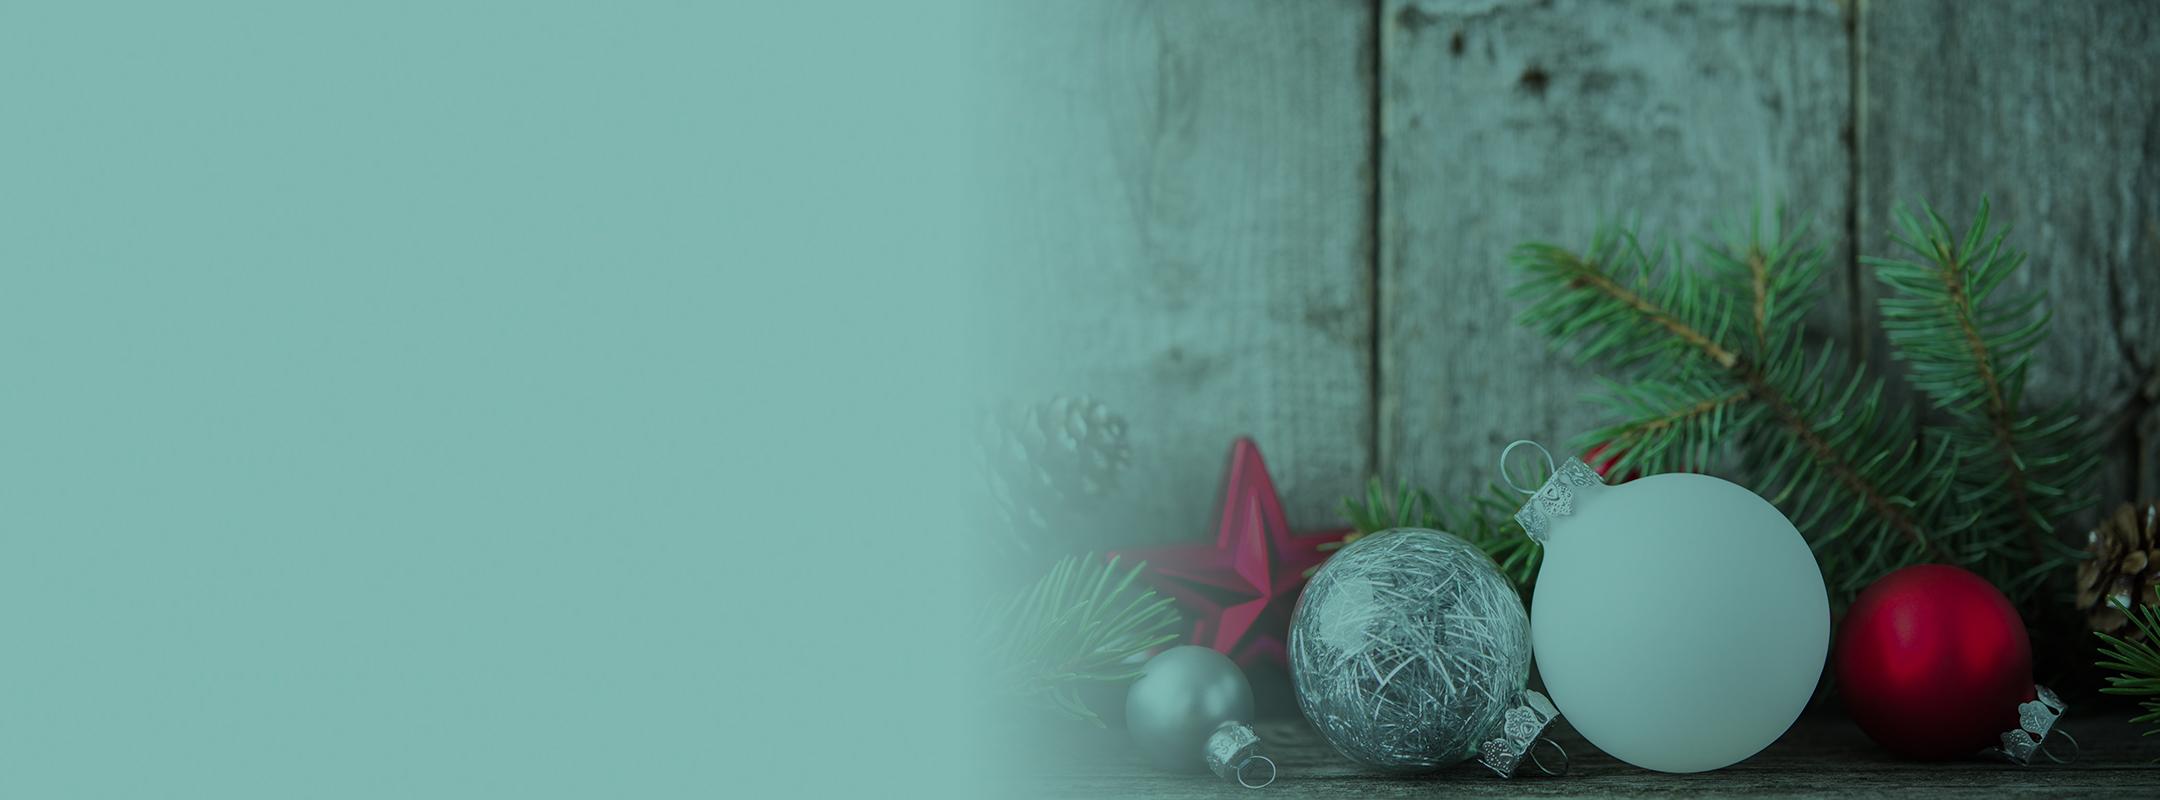 HolidayParty17_web